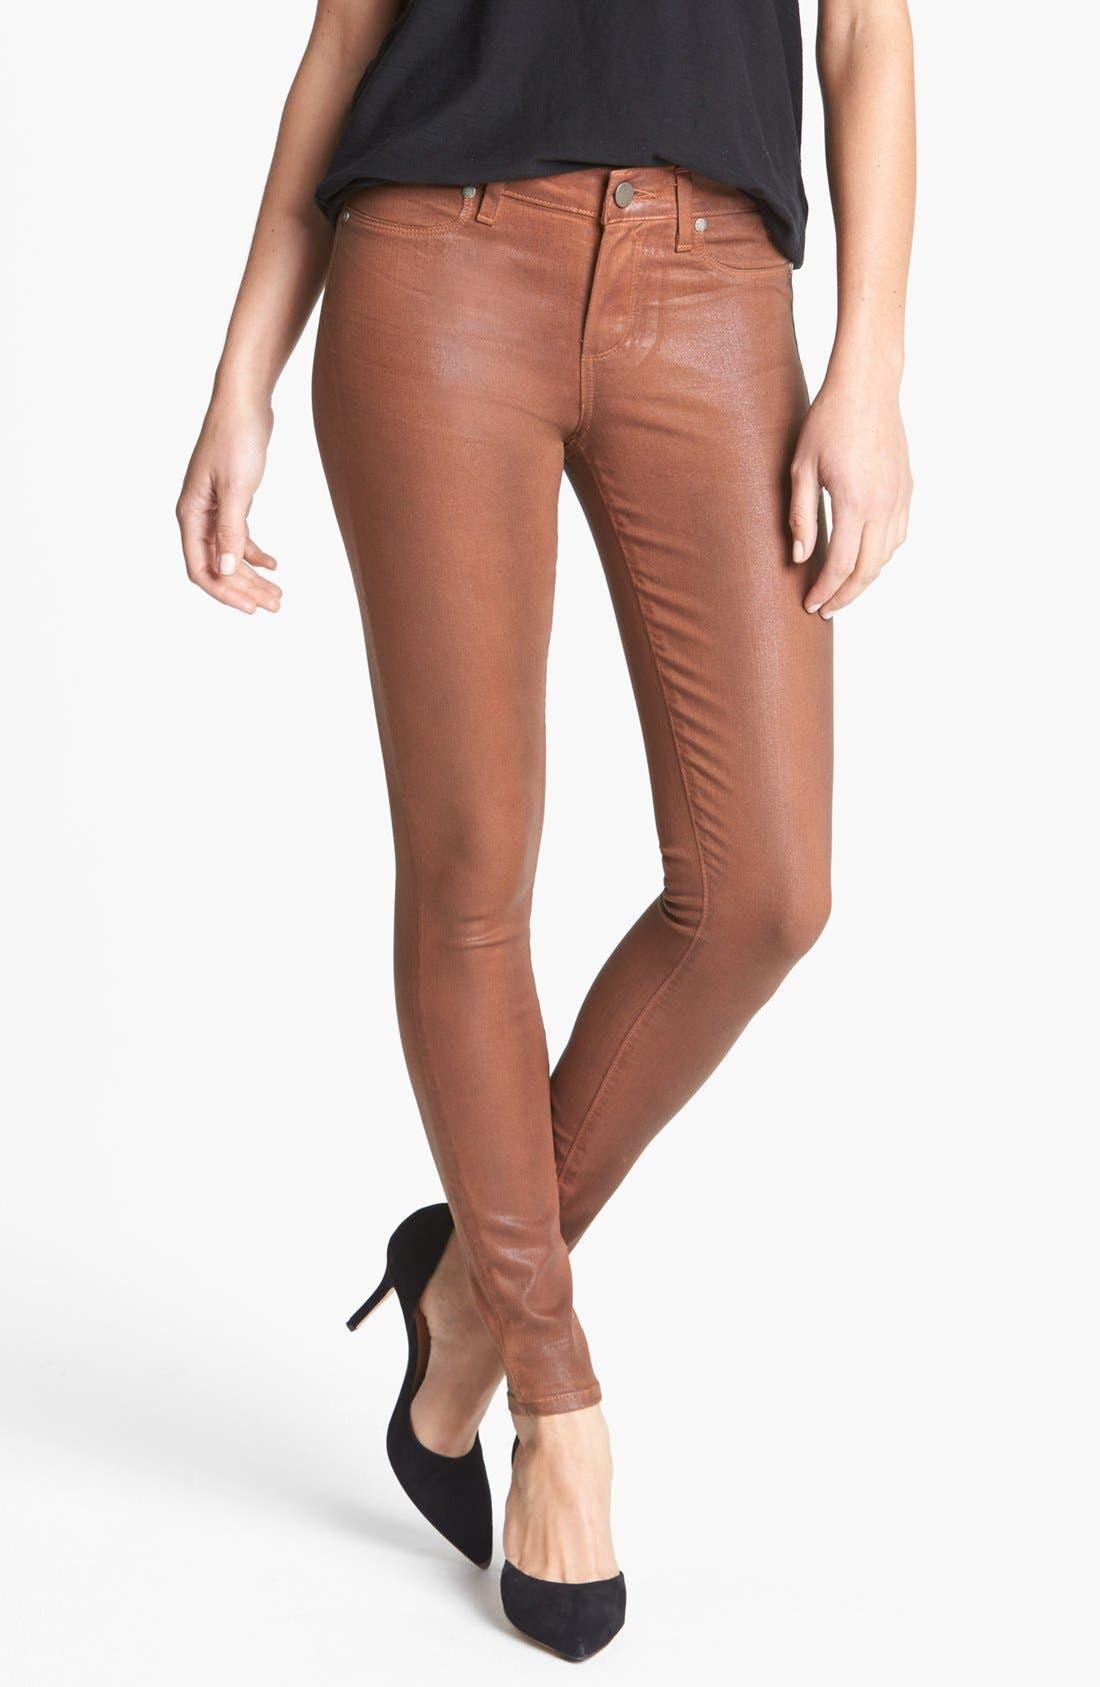 Alternate Image 1 Selected - Paige Denim 'Verdugo' Coated Ultra Skinny Jeans (Saddle)